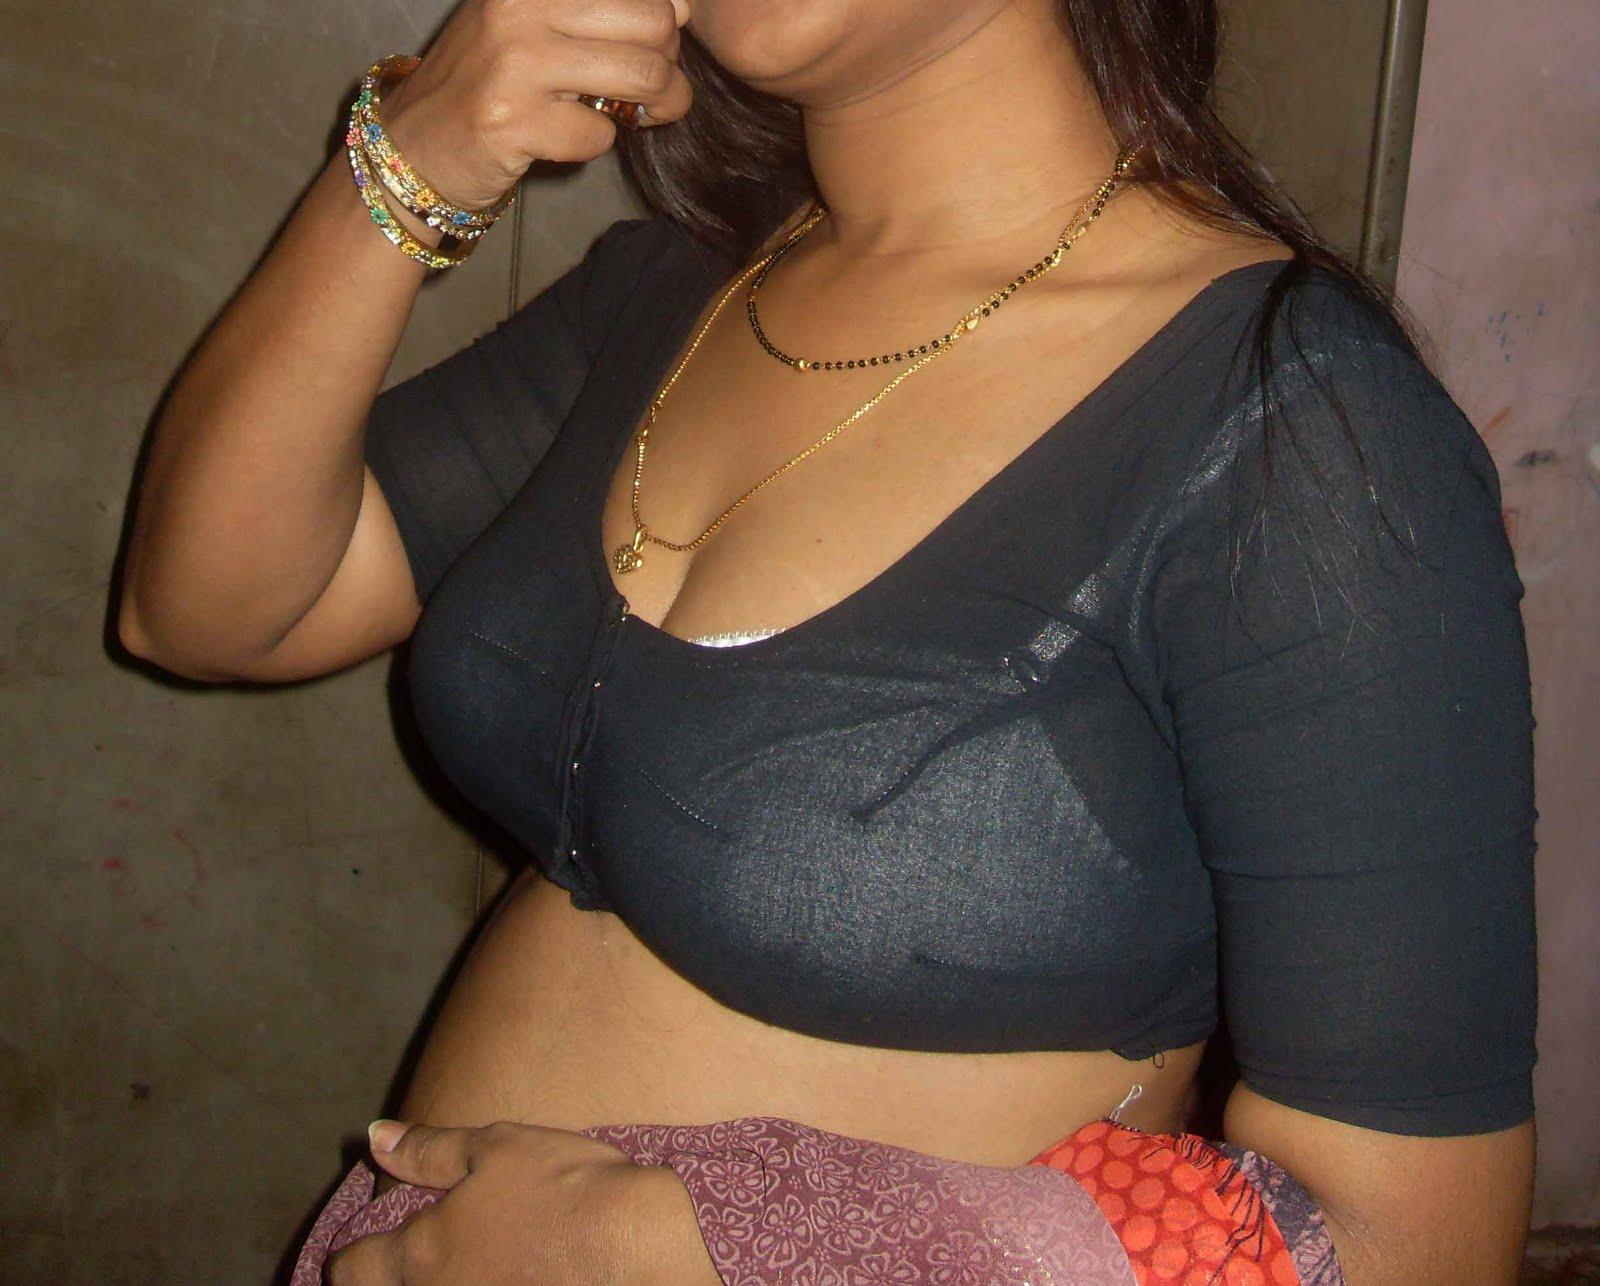 Porn galleries Mariah carey in pantyhose